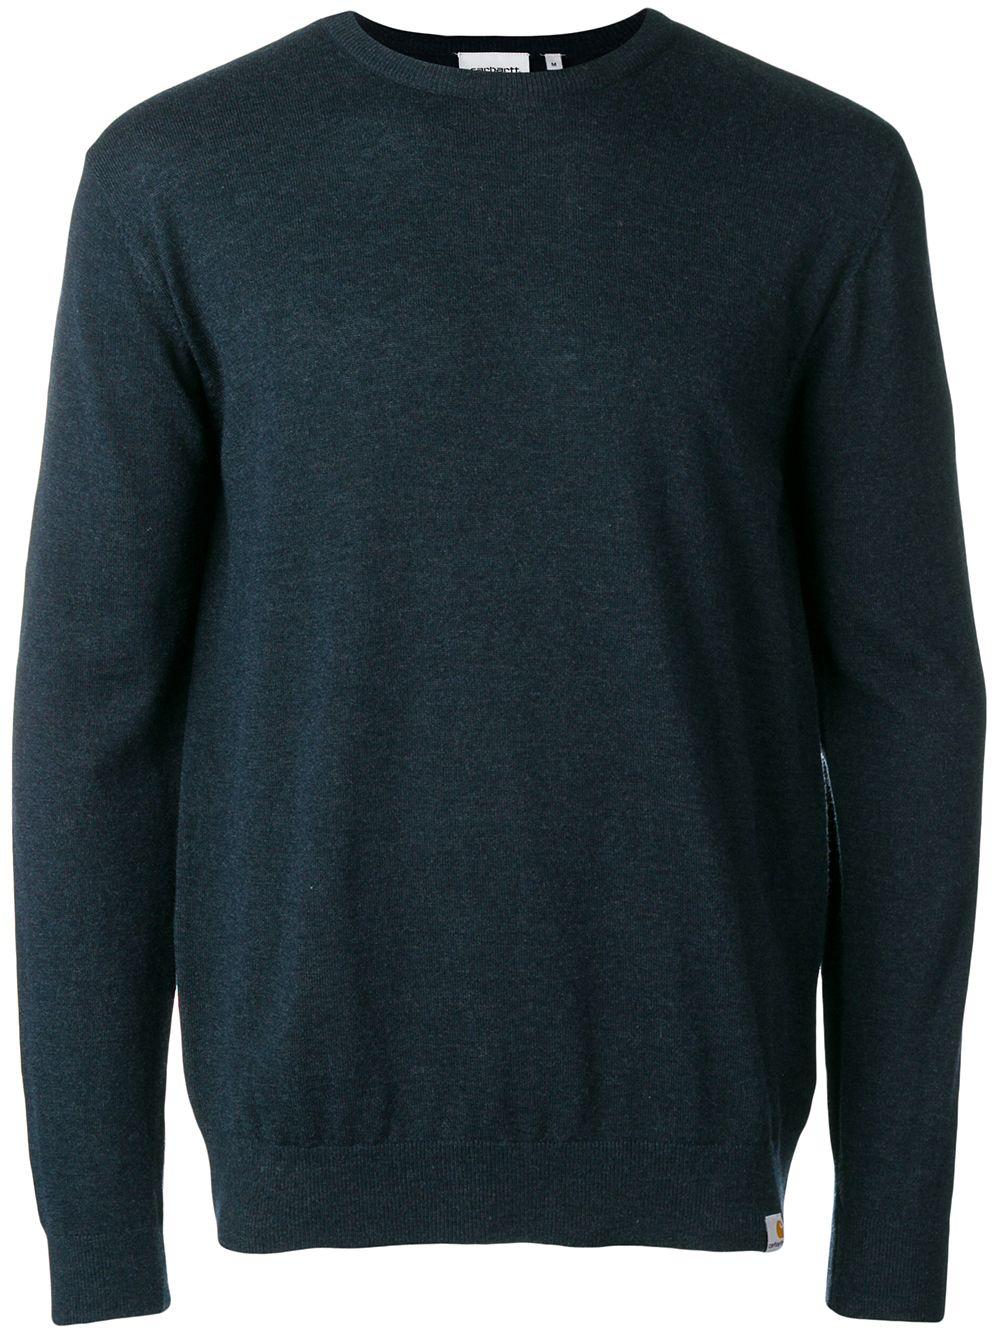 crewneck sweater man blue navy CARHARTT WIP | Sweaters | I0237761C.00